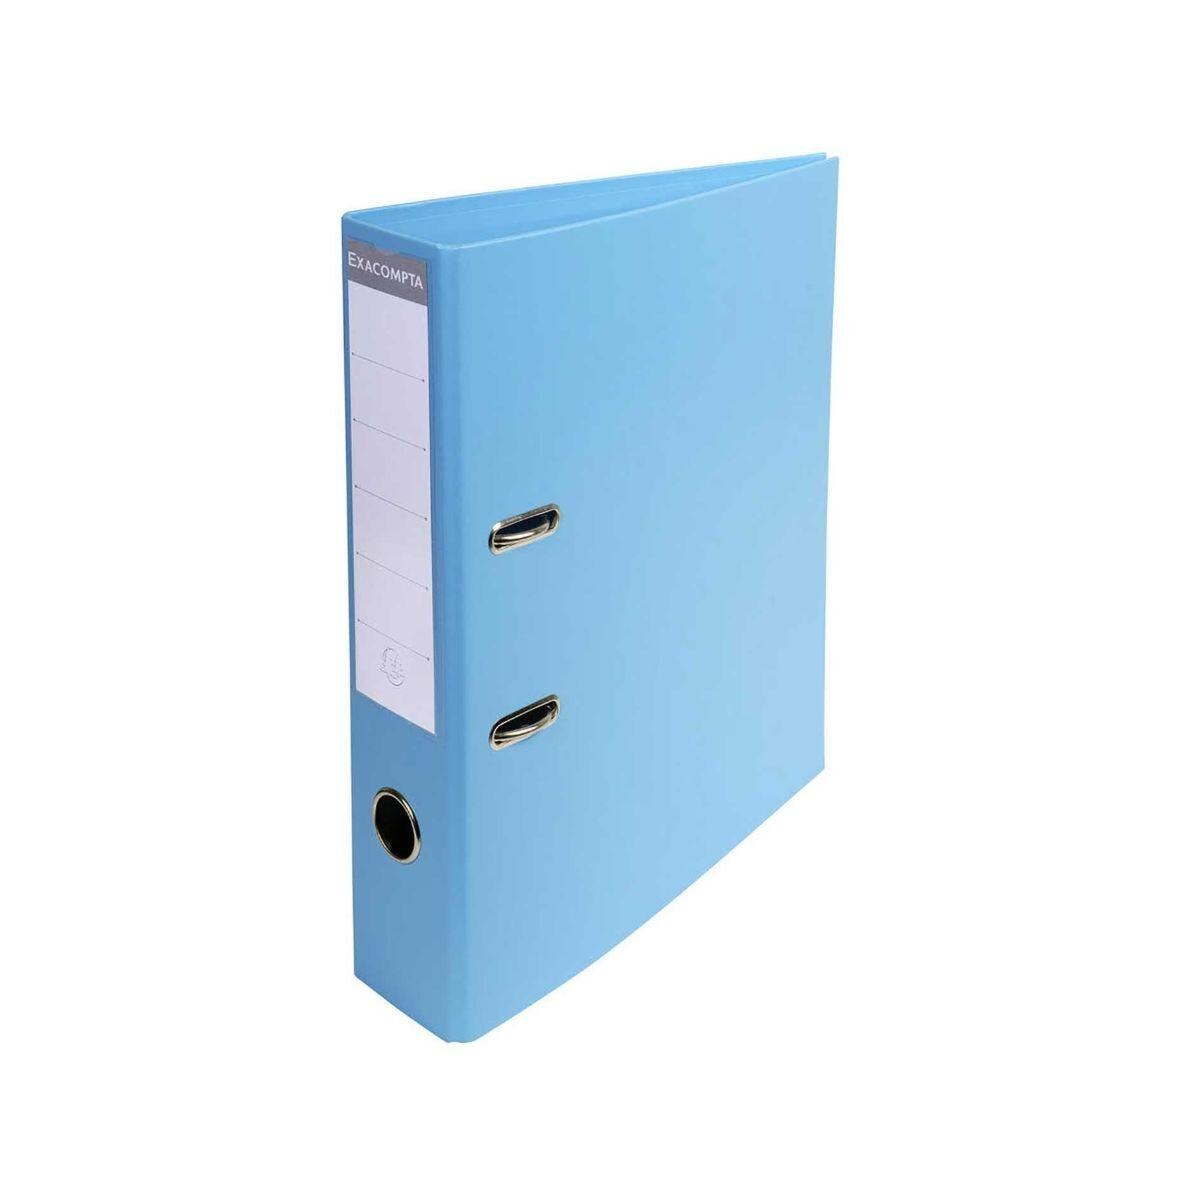 Exacompta Pastel Lever Arch File light blue